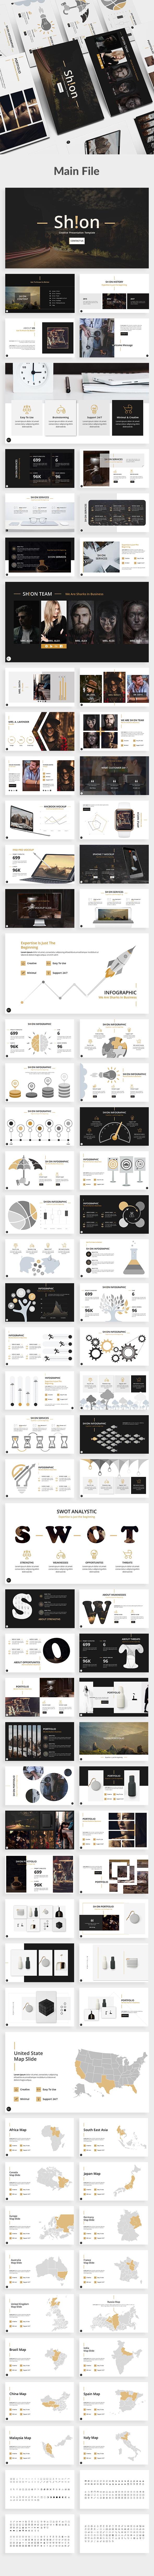 Shion Creative Powerpoint Template - Creative PowerPoint Templates